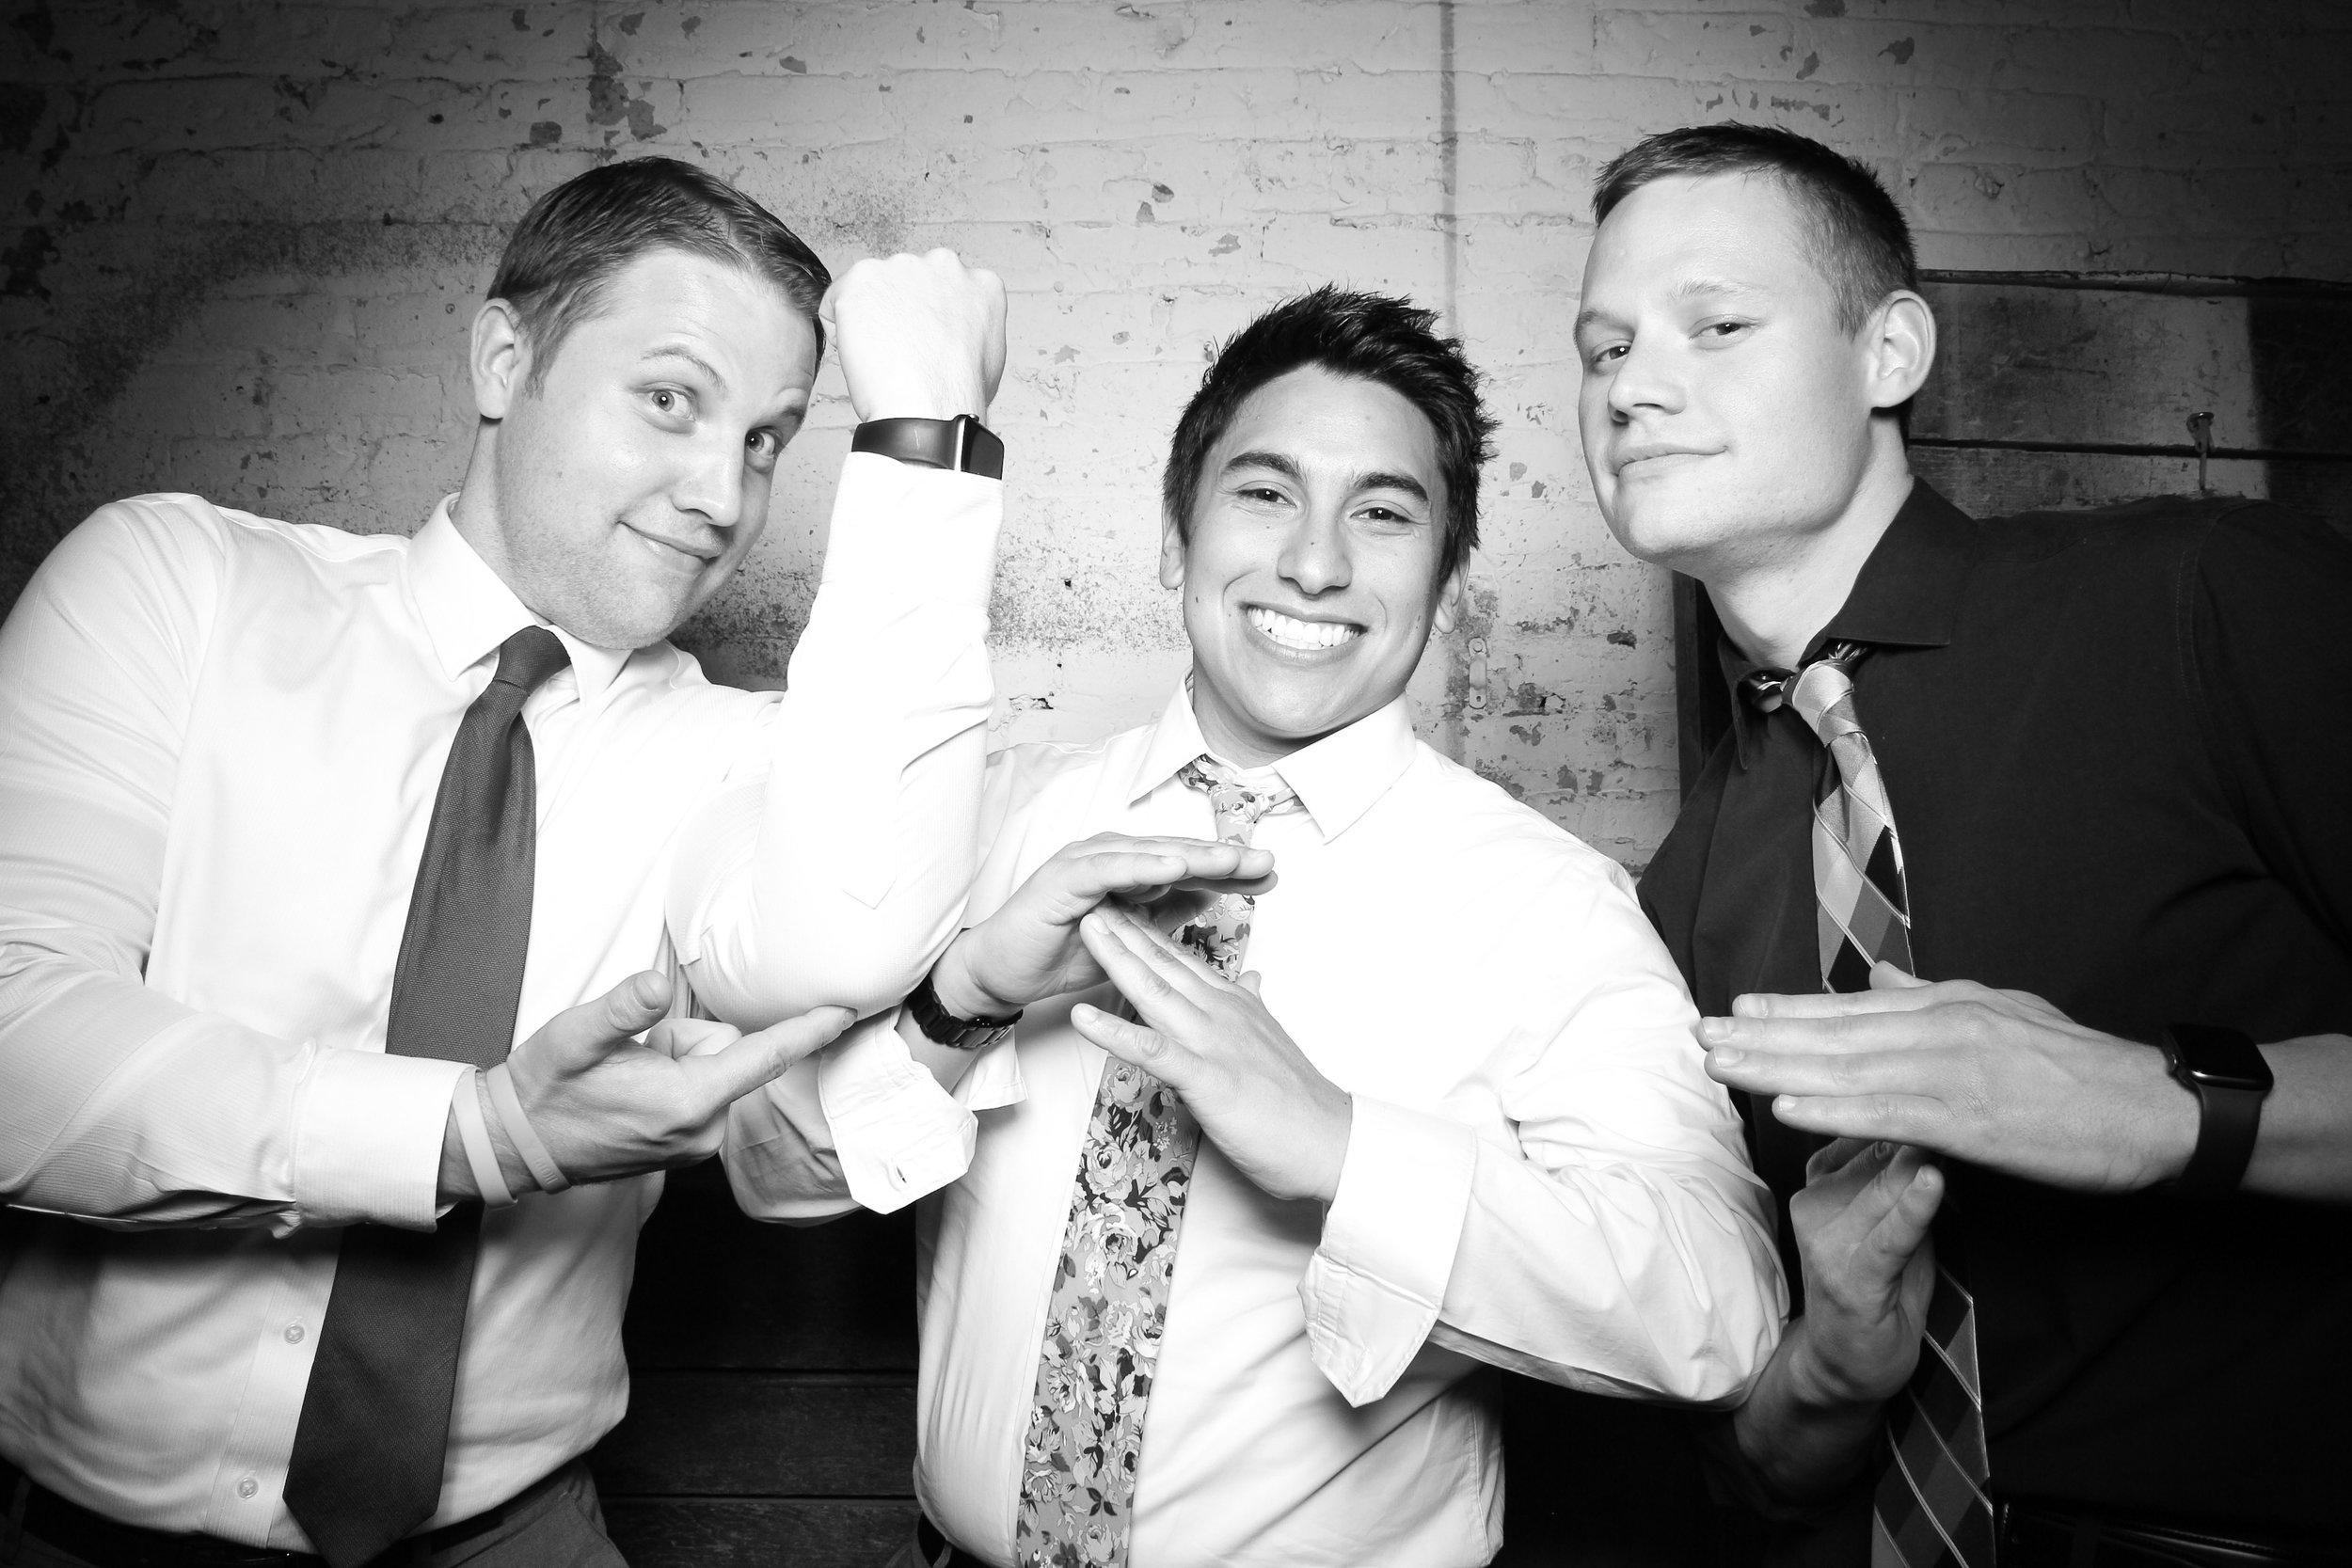 The_Joinery_Wedding_Venue_Logan_Square_Reception_13.jpg